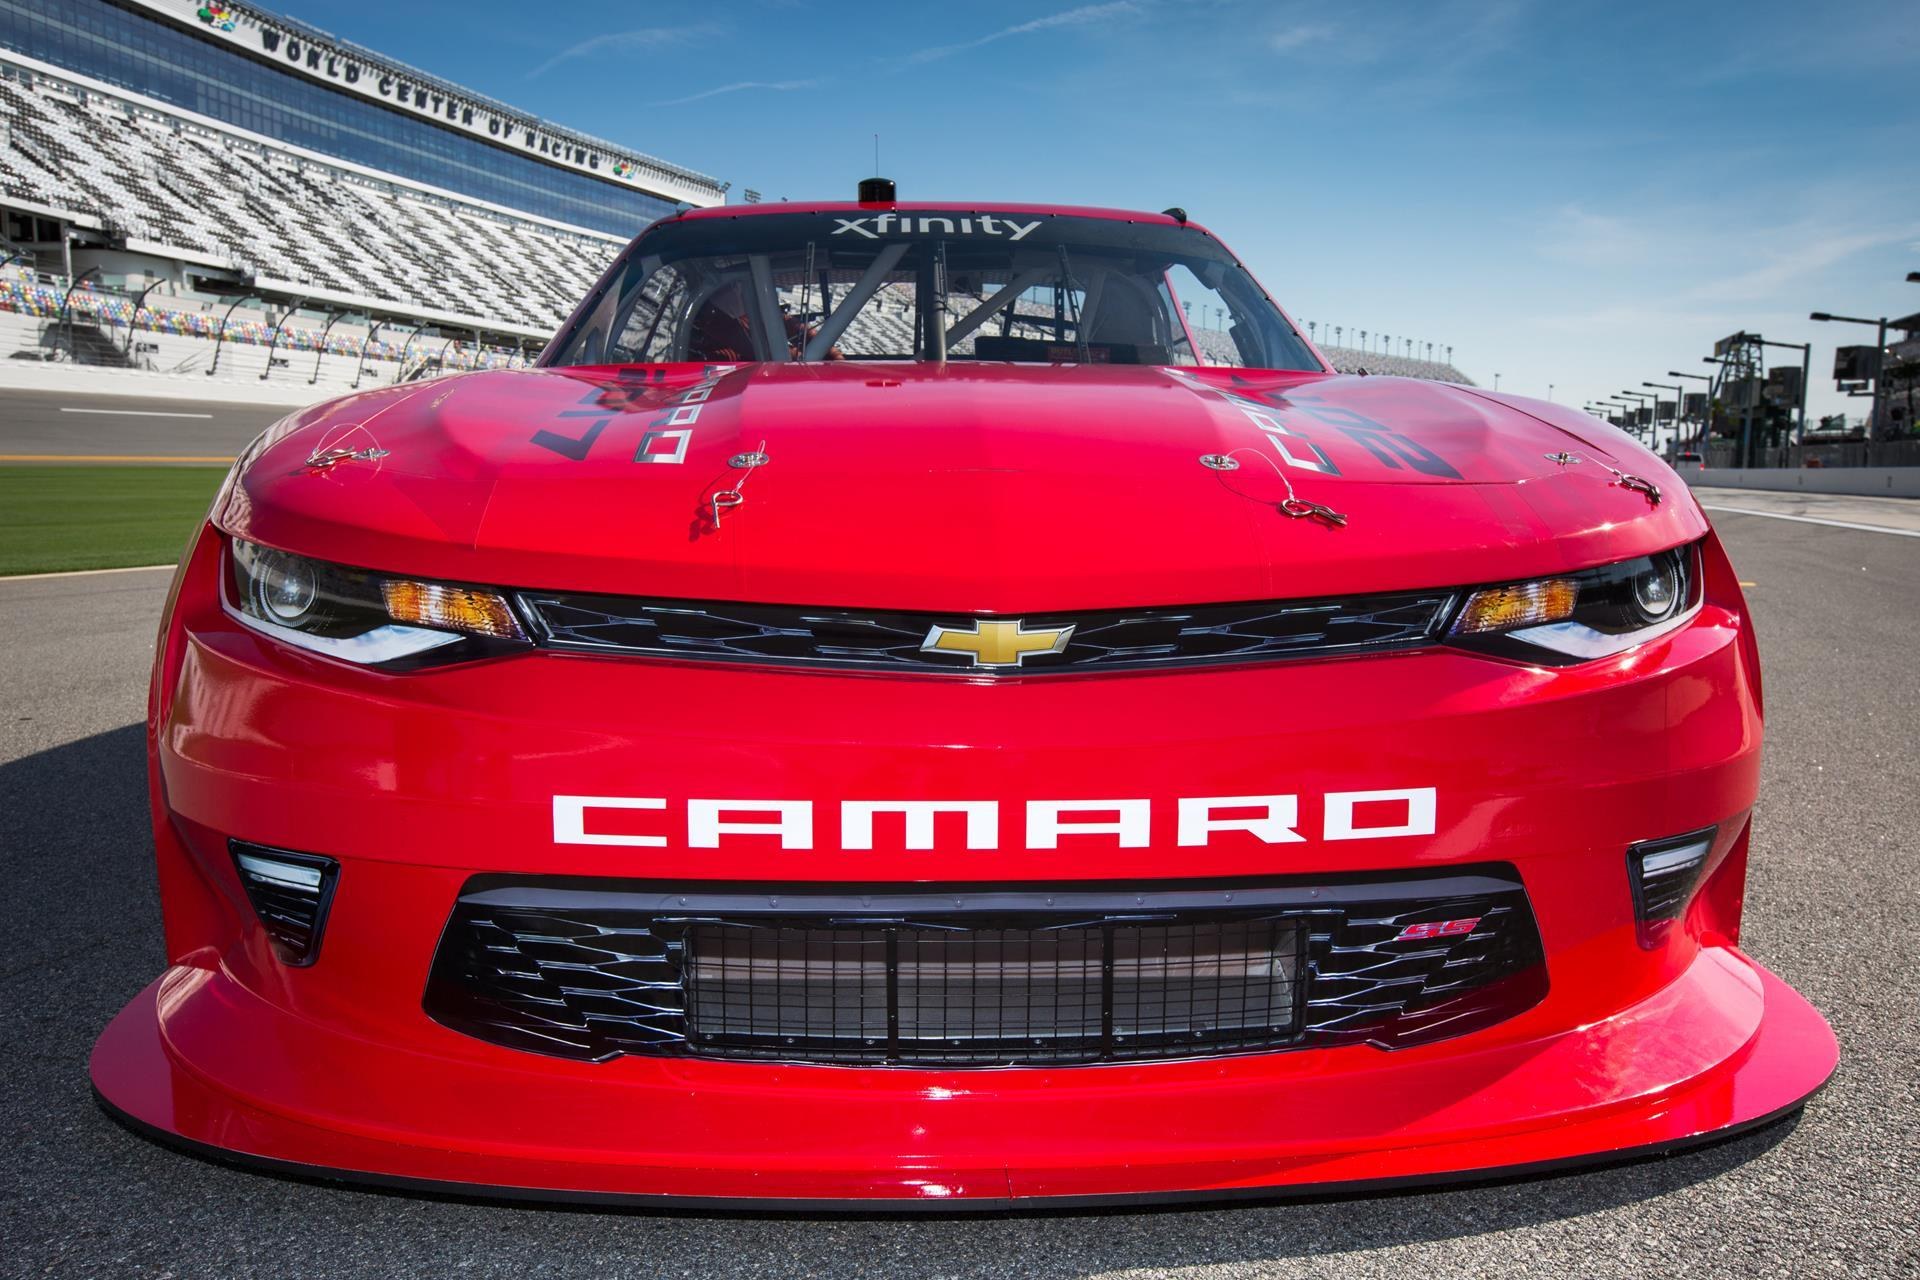 2017 Chevrolet Camaro NASCAR - conceptcarz.com